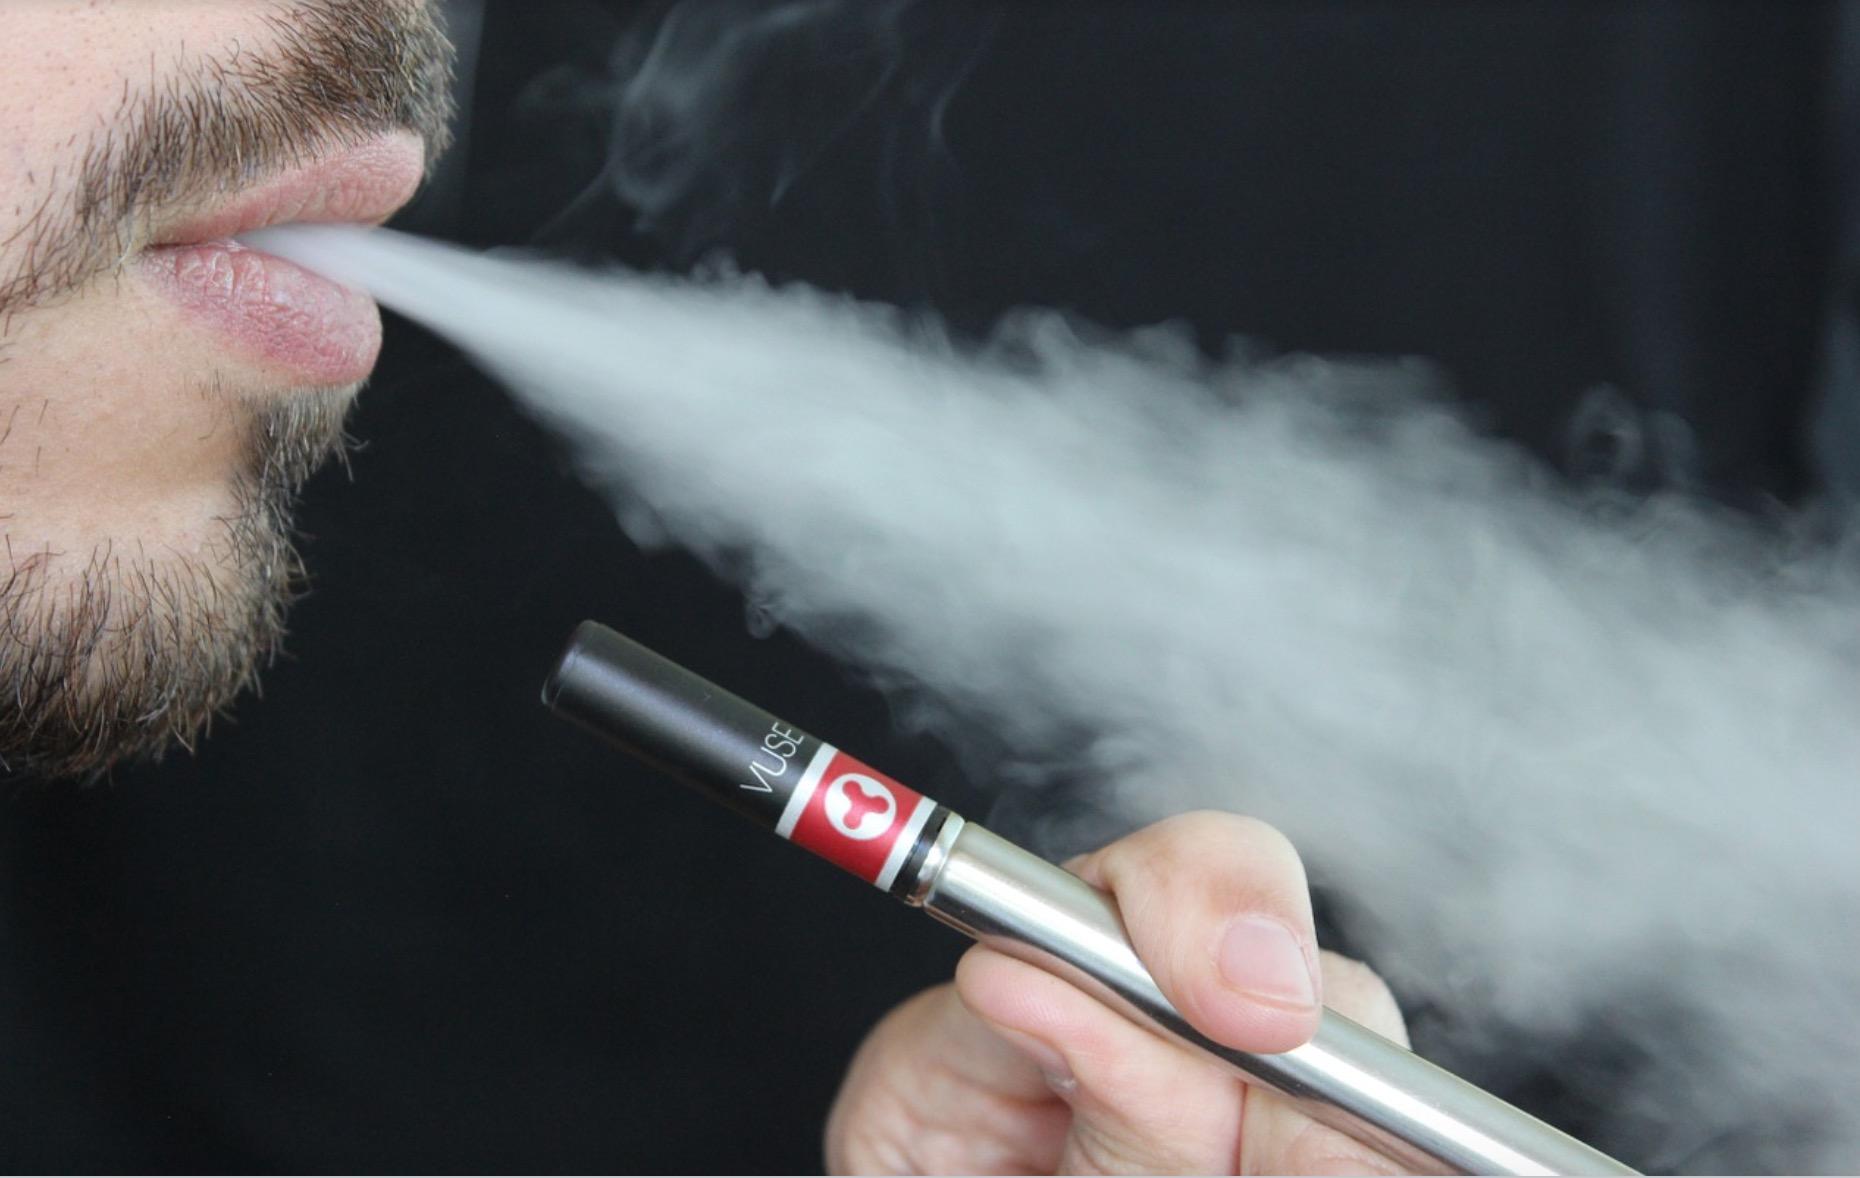 Senators begin moving forward with vaping ban